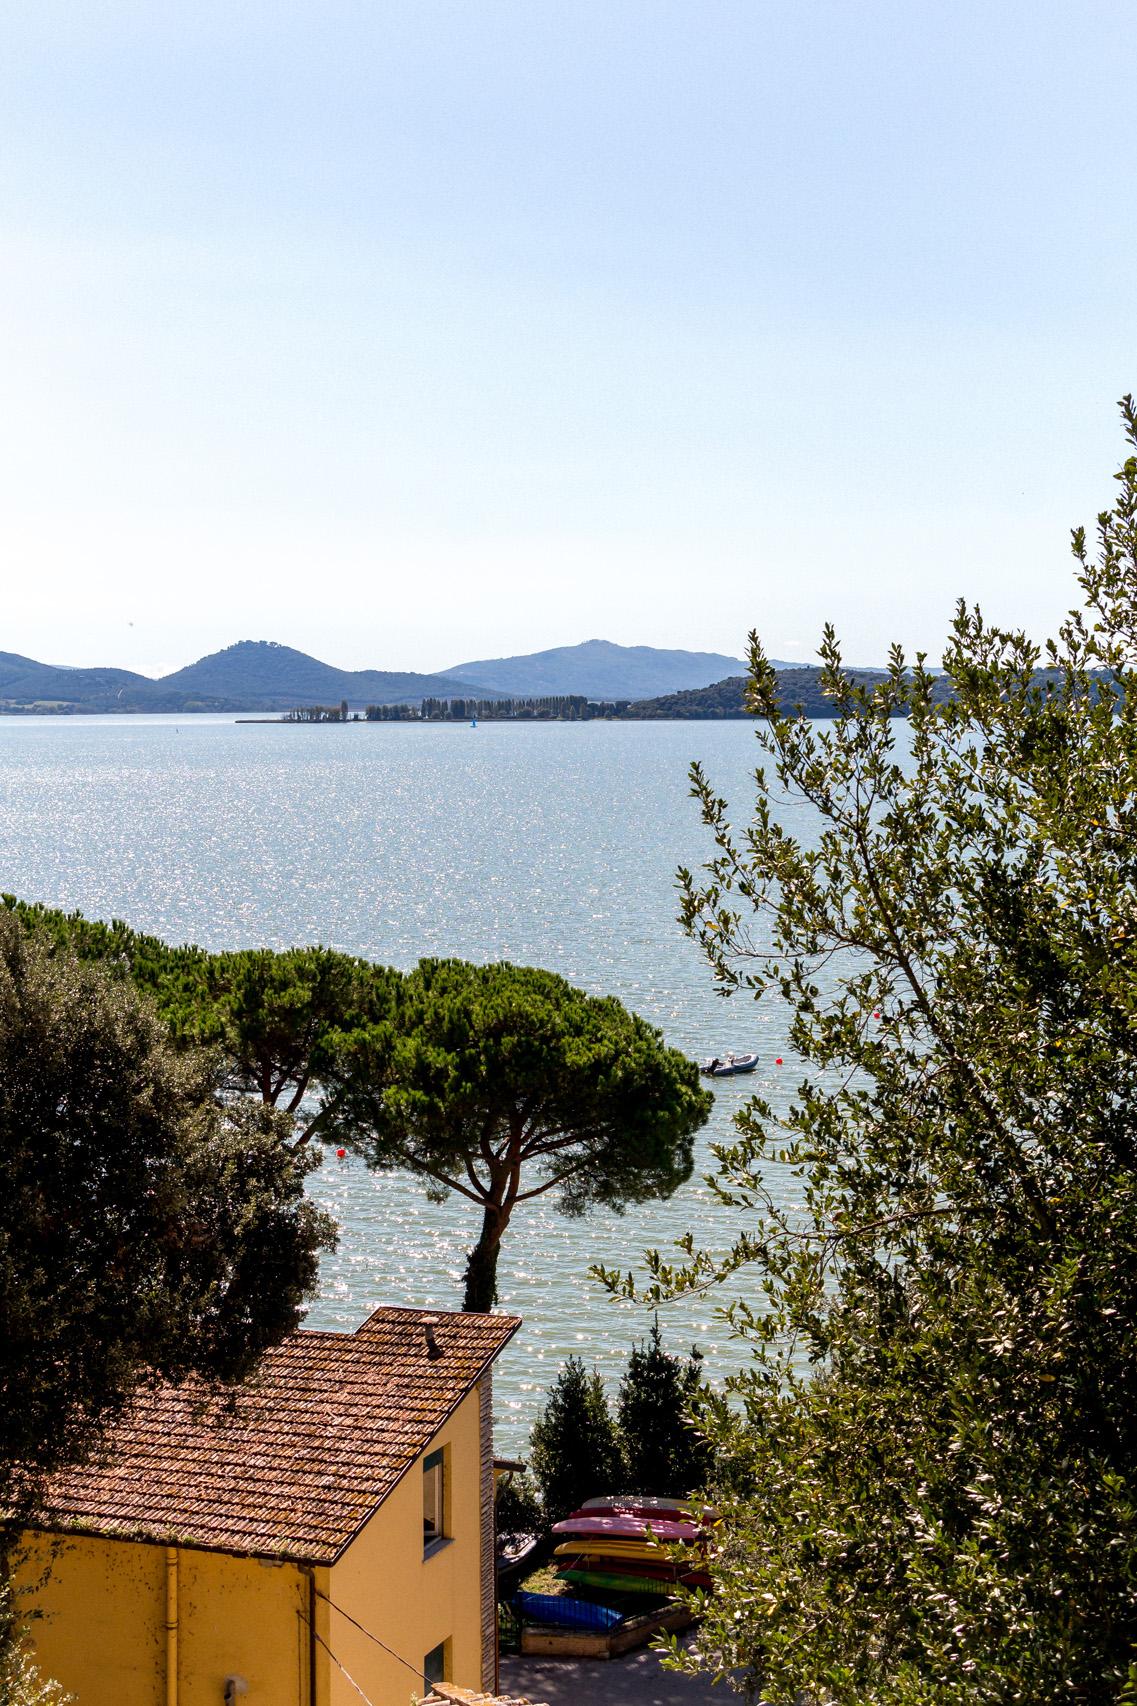 Trasimeno lake in Umbria, Italy